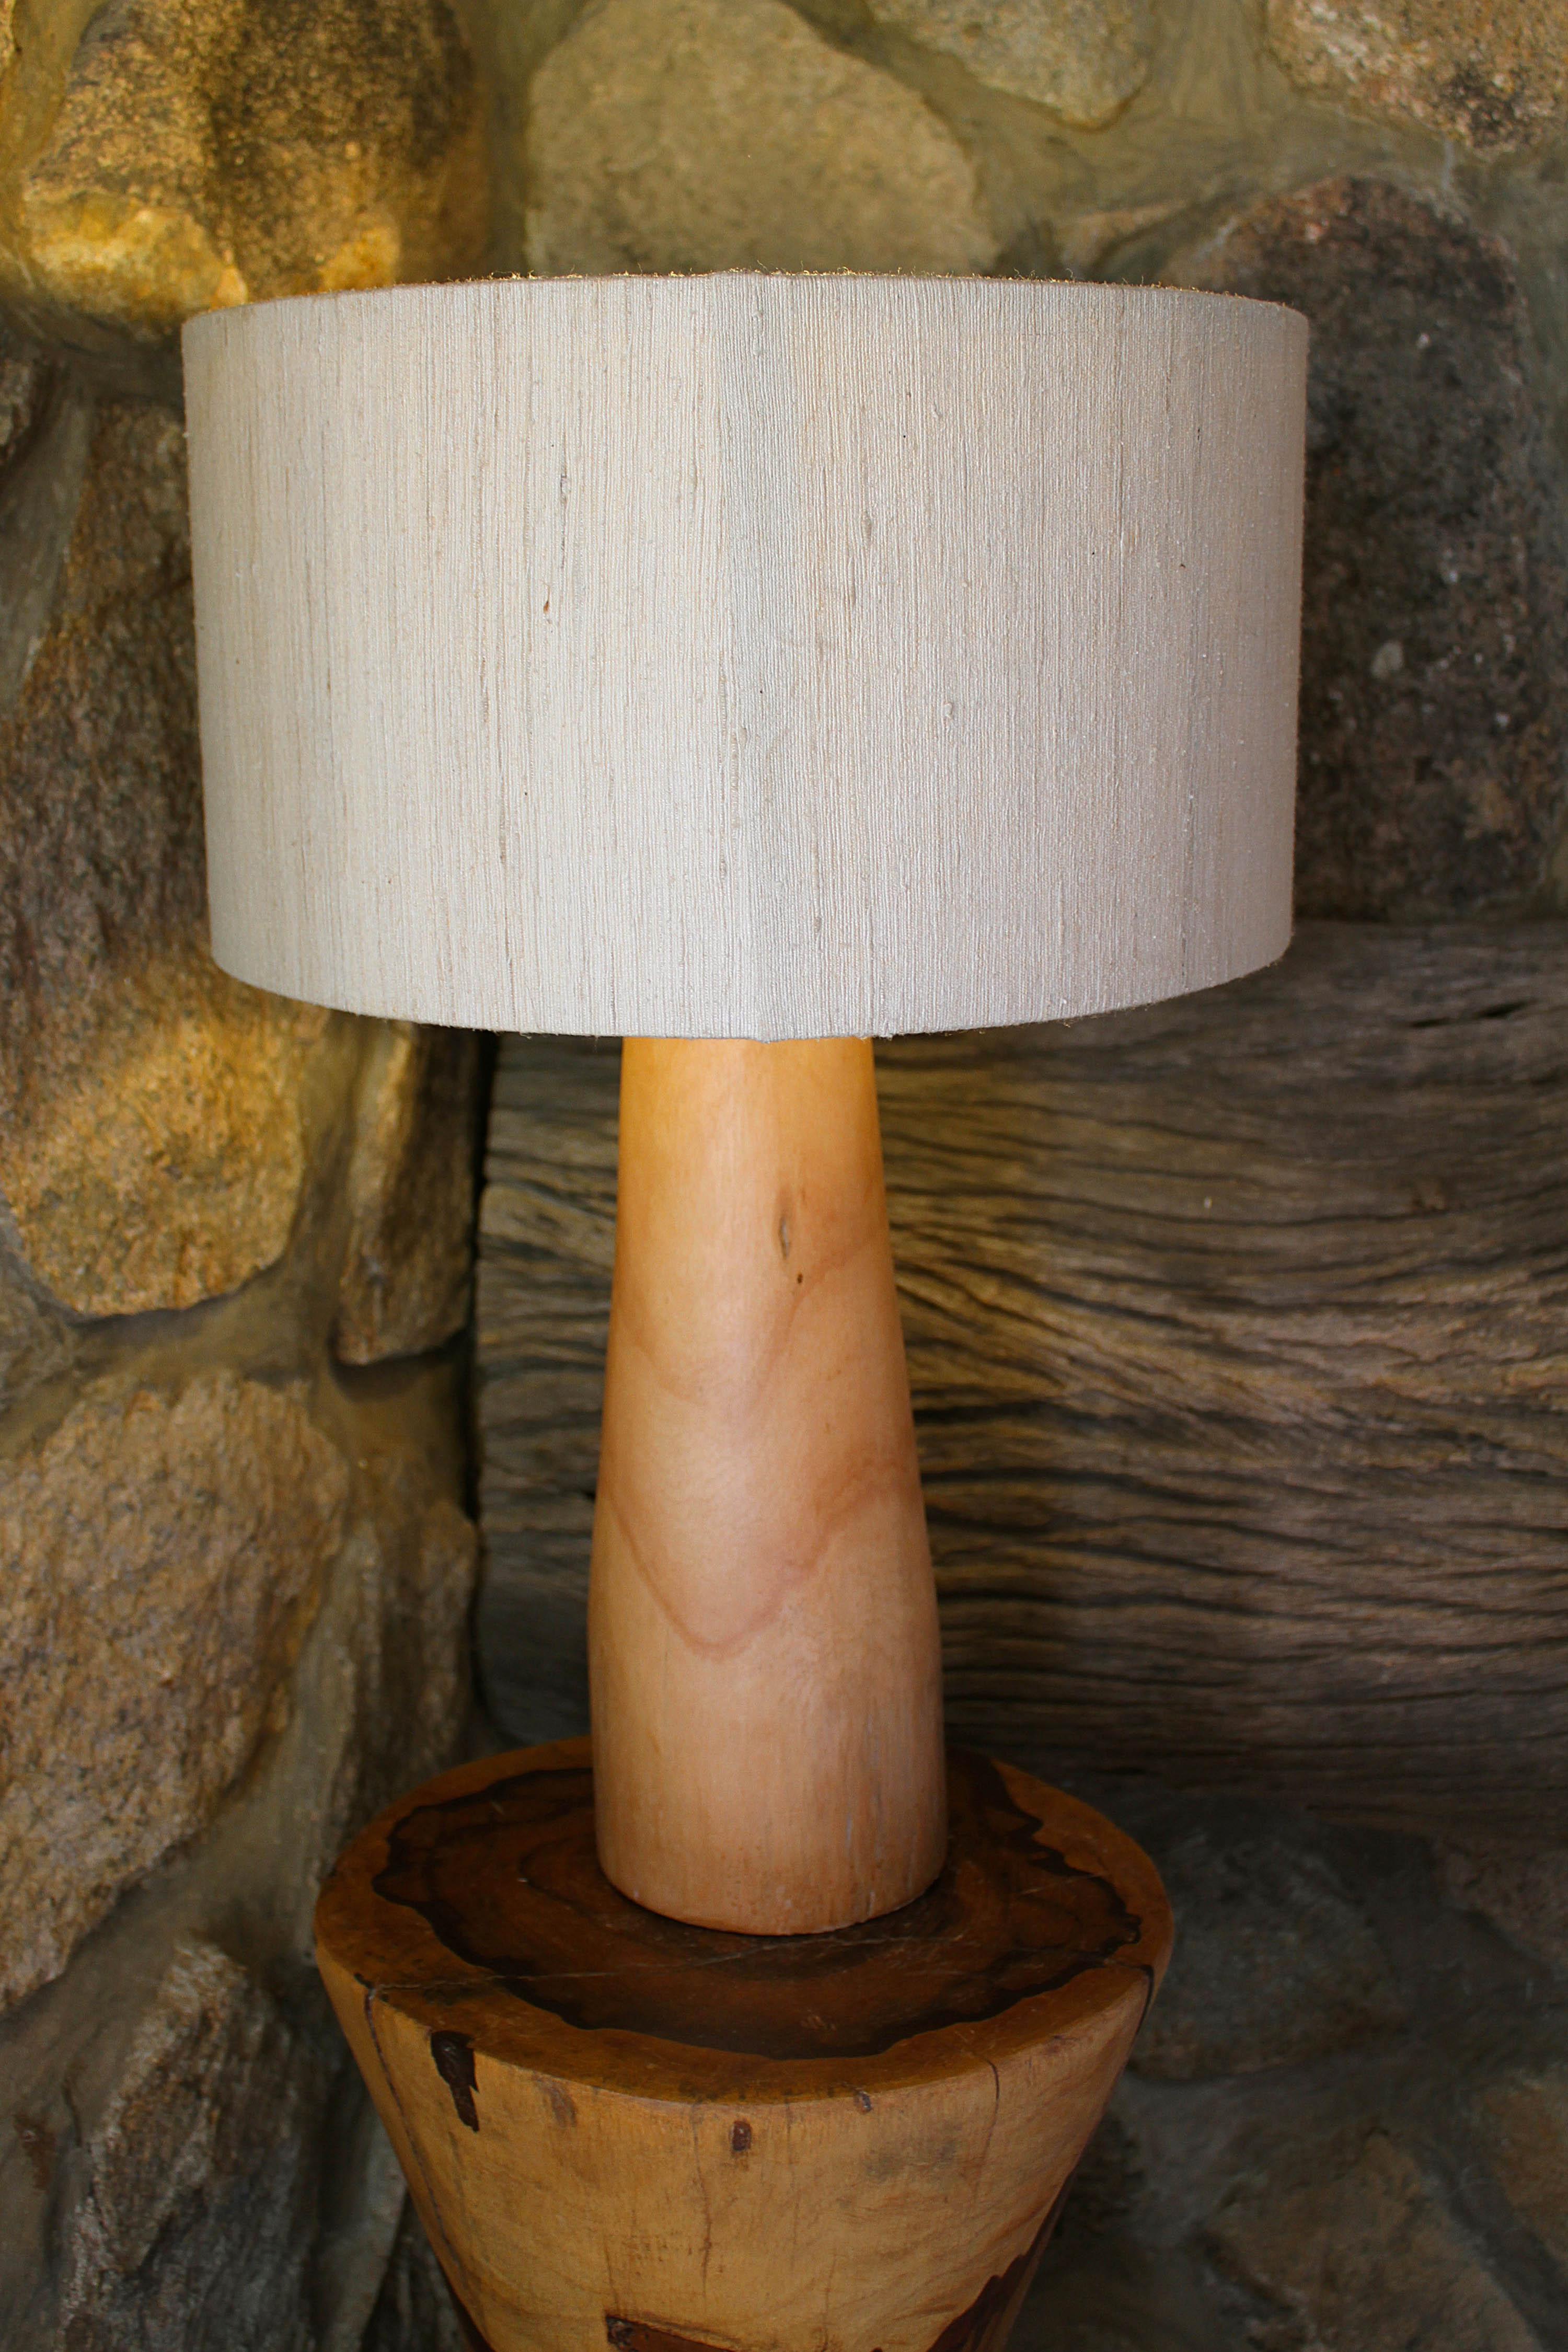 lampbase bluegum wood hand chipped smooth